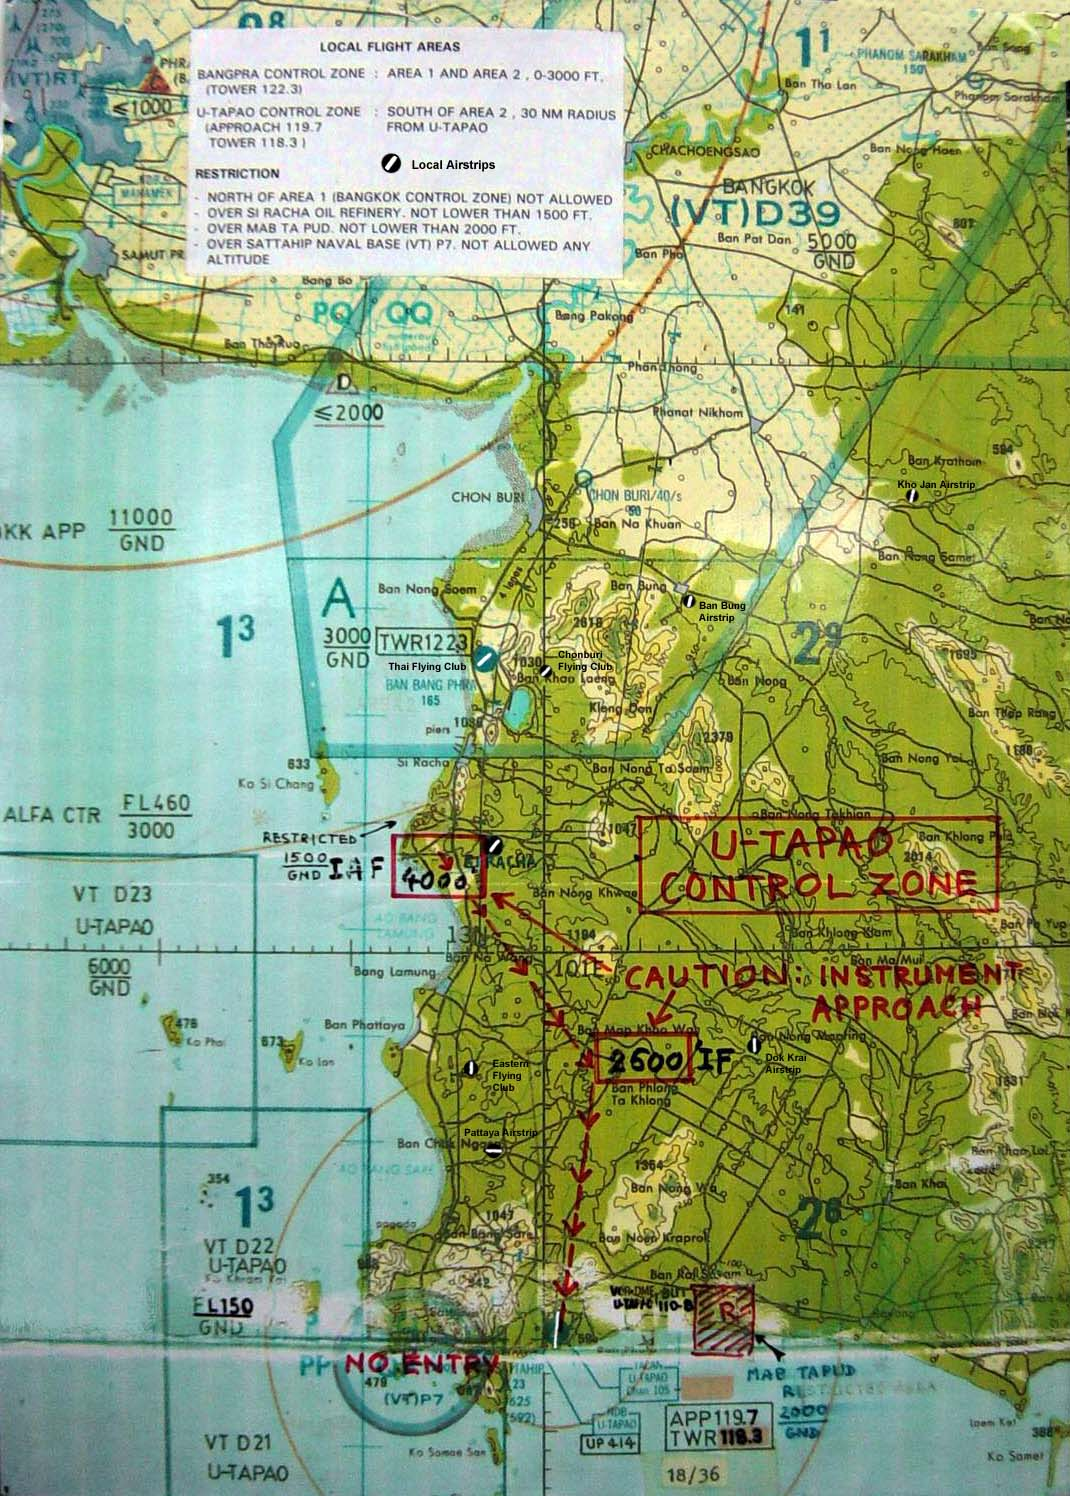 Map of Local Airstrips near Bang PhraChonburiPattaya